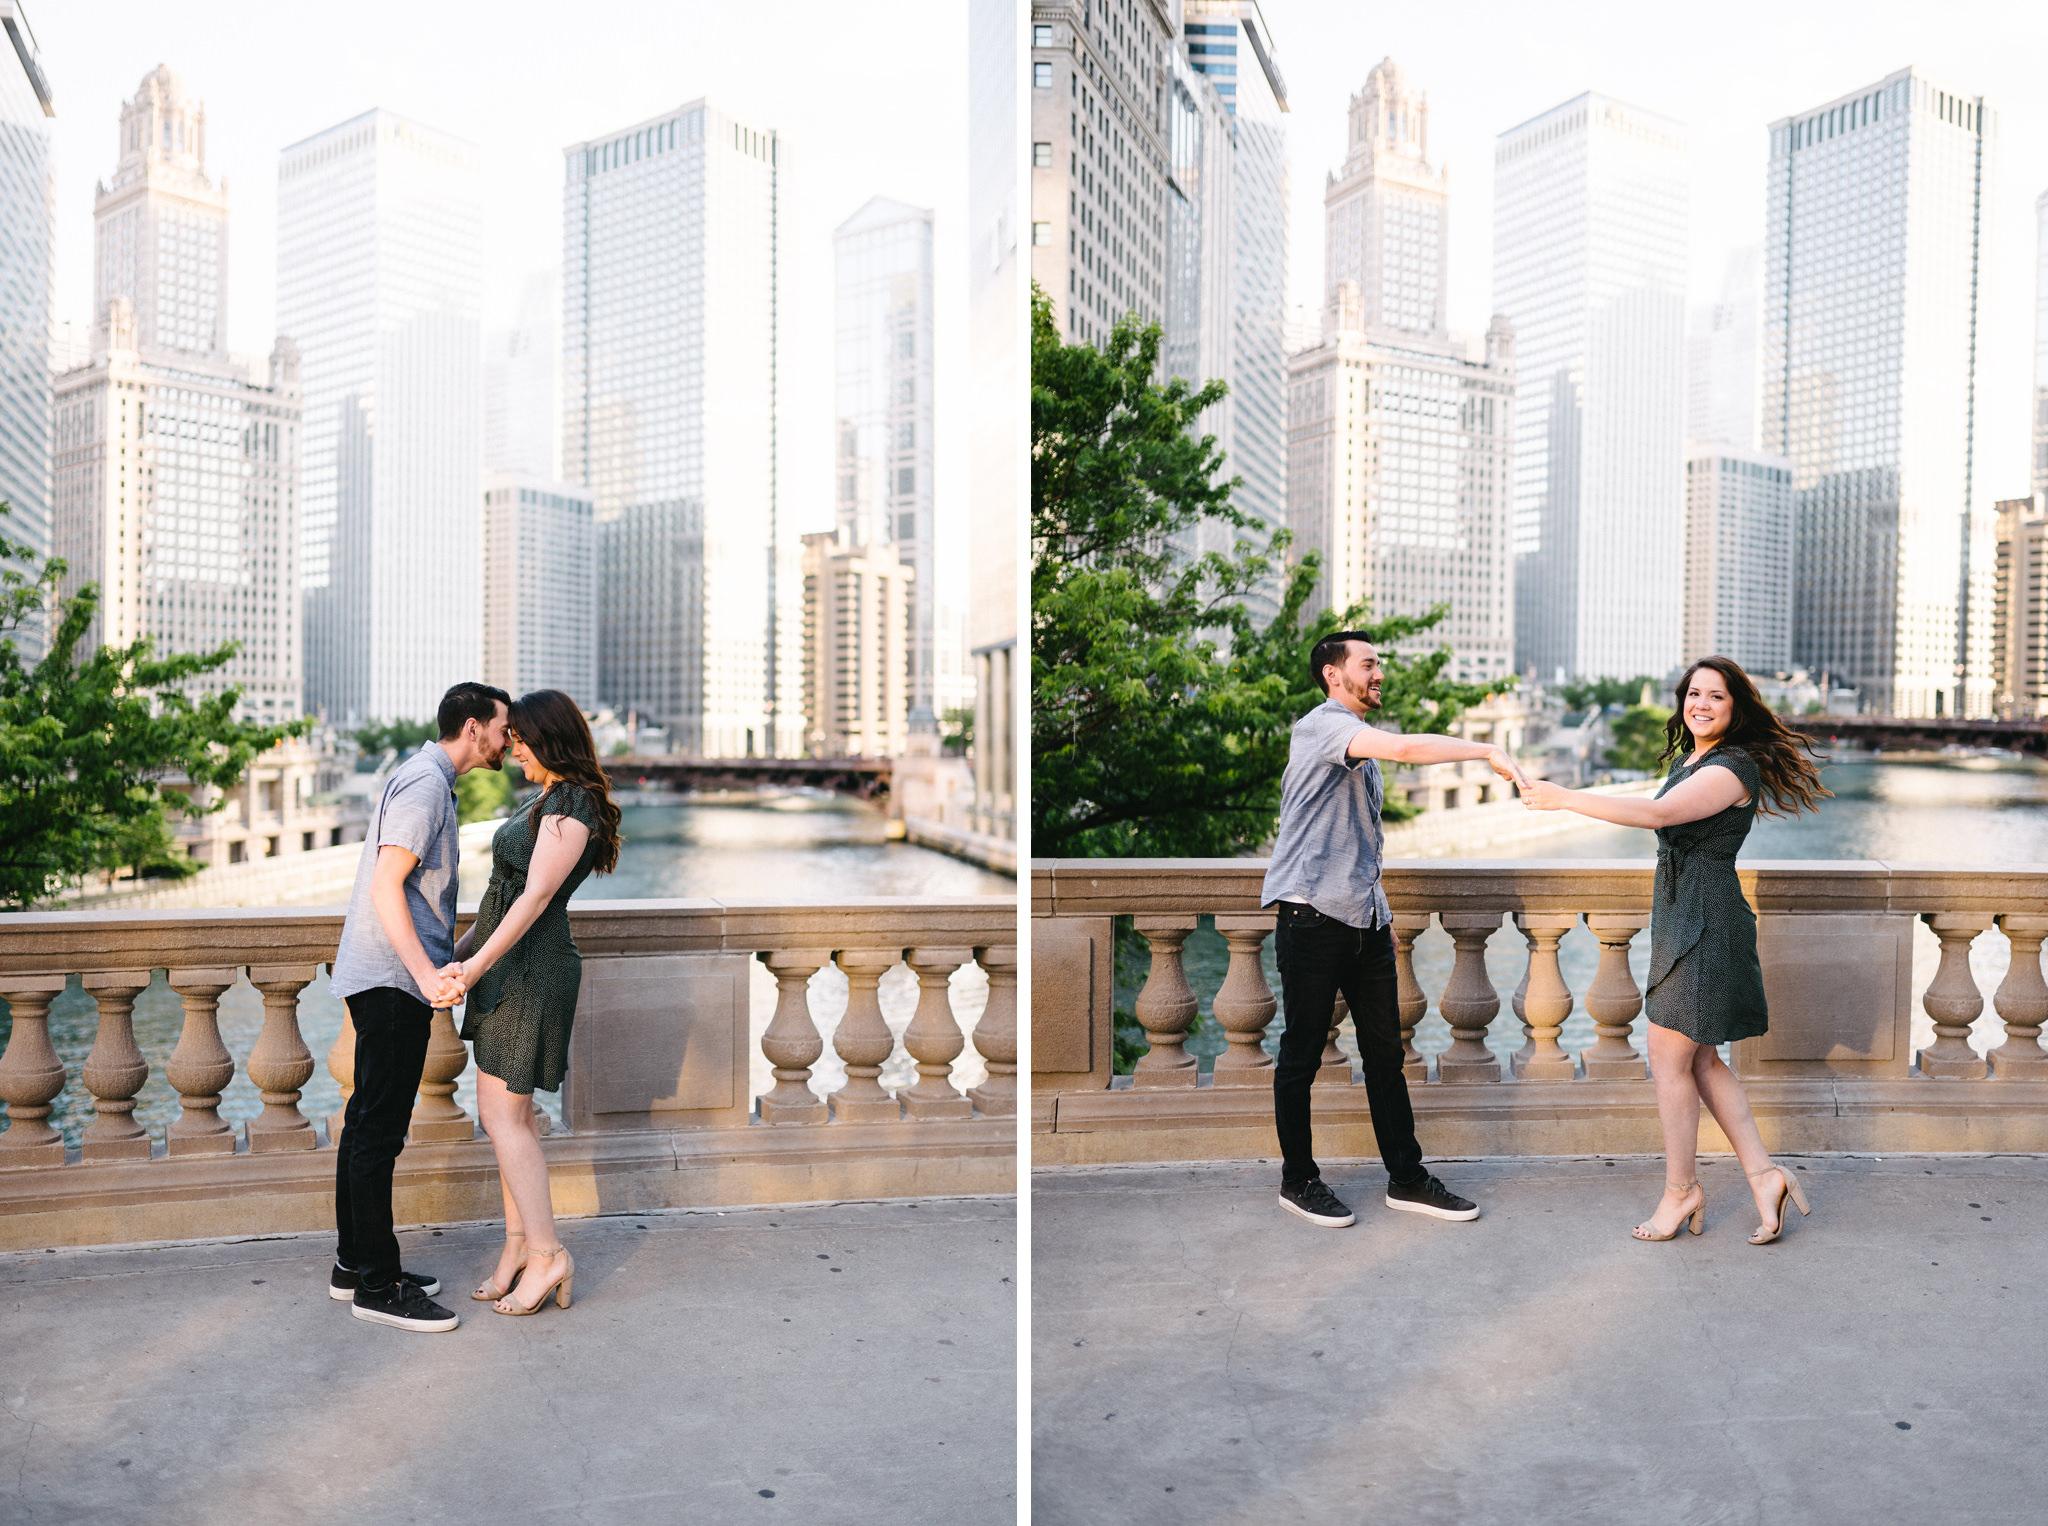 003-rempel-photography-chicago-wedding-inspiration-matt-mariana-riverwalk-engagement-session-city-view-loft-ohana-events.jpg